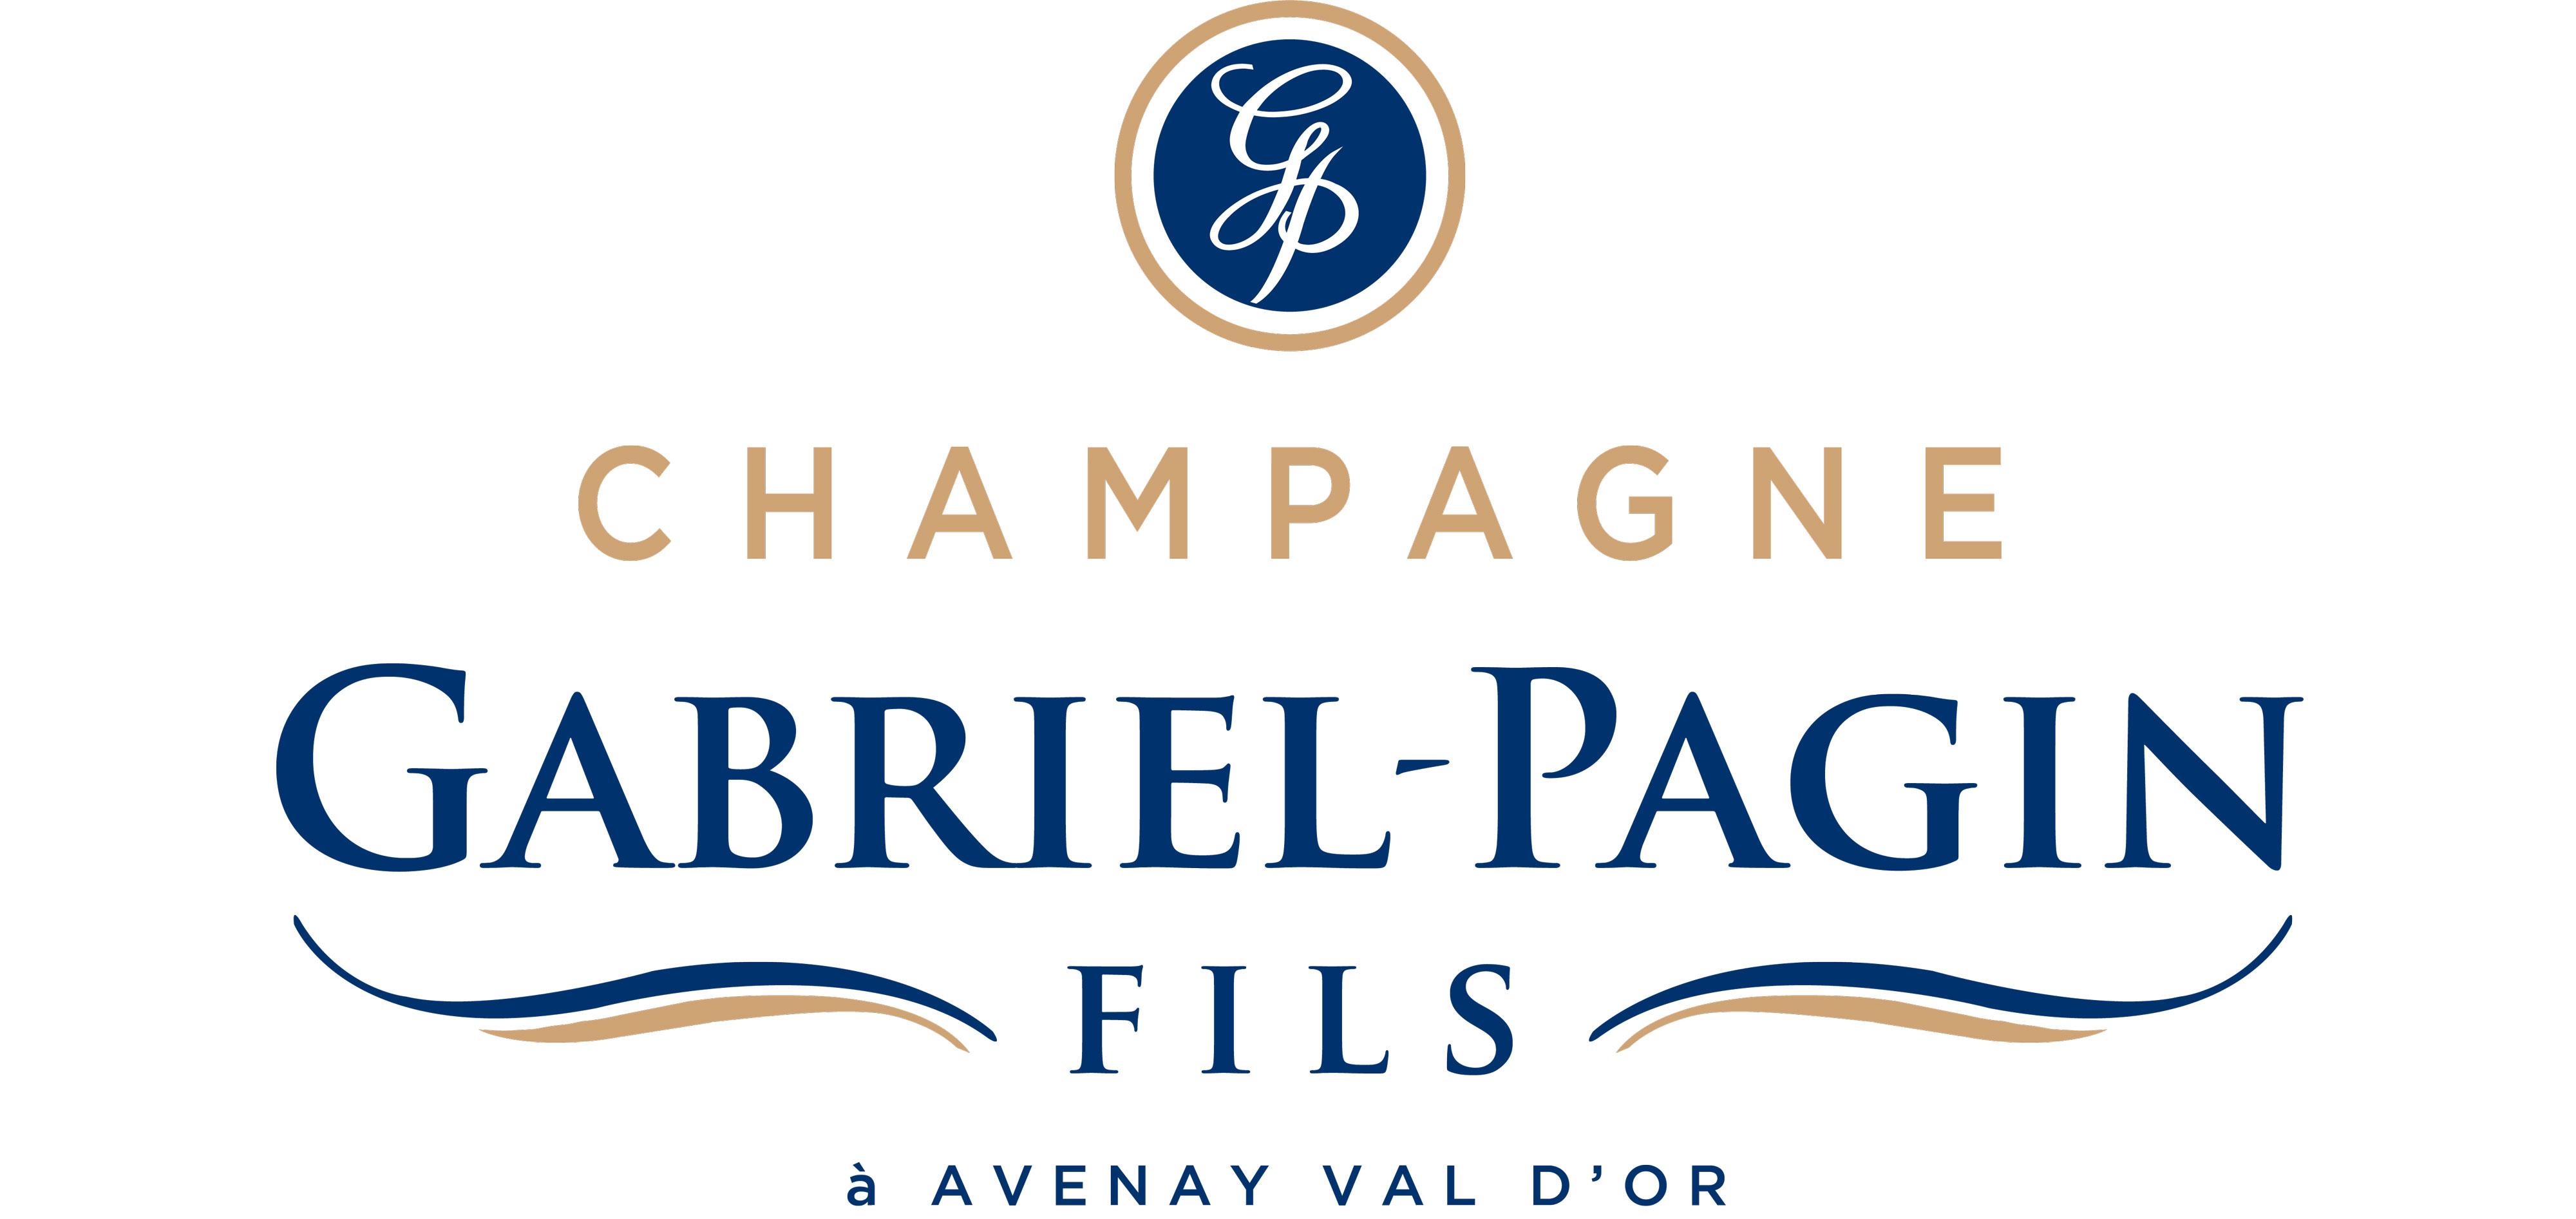 champagne-gabriel-pagin